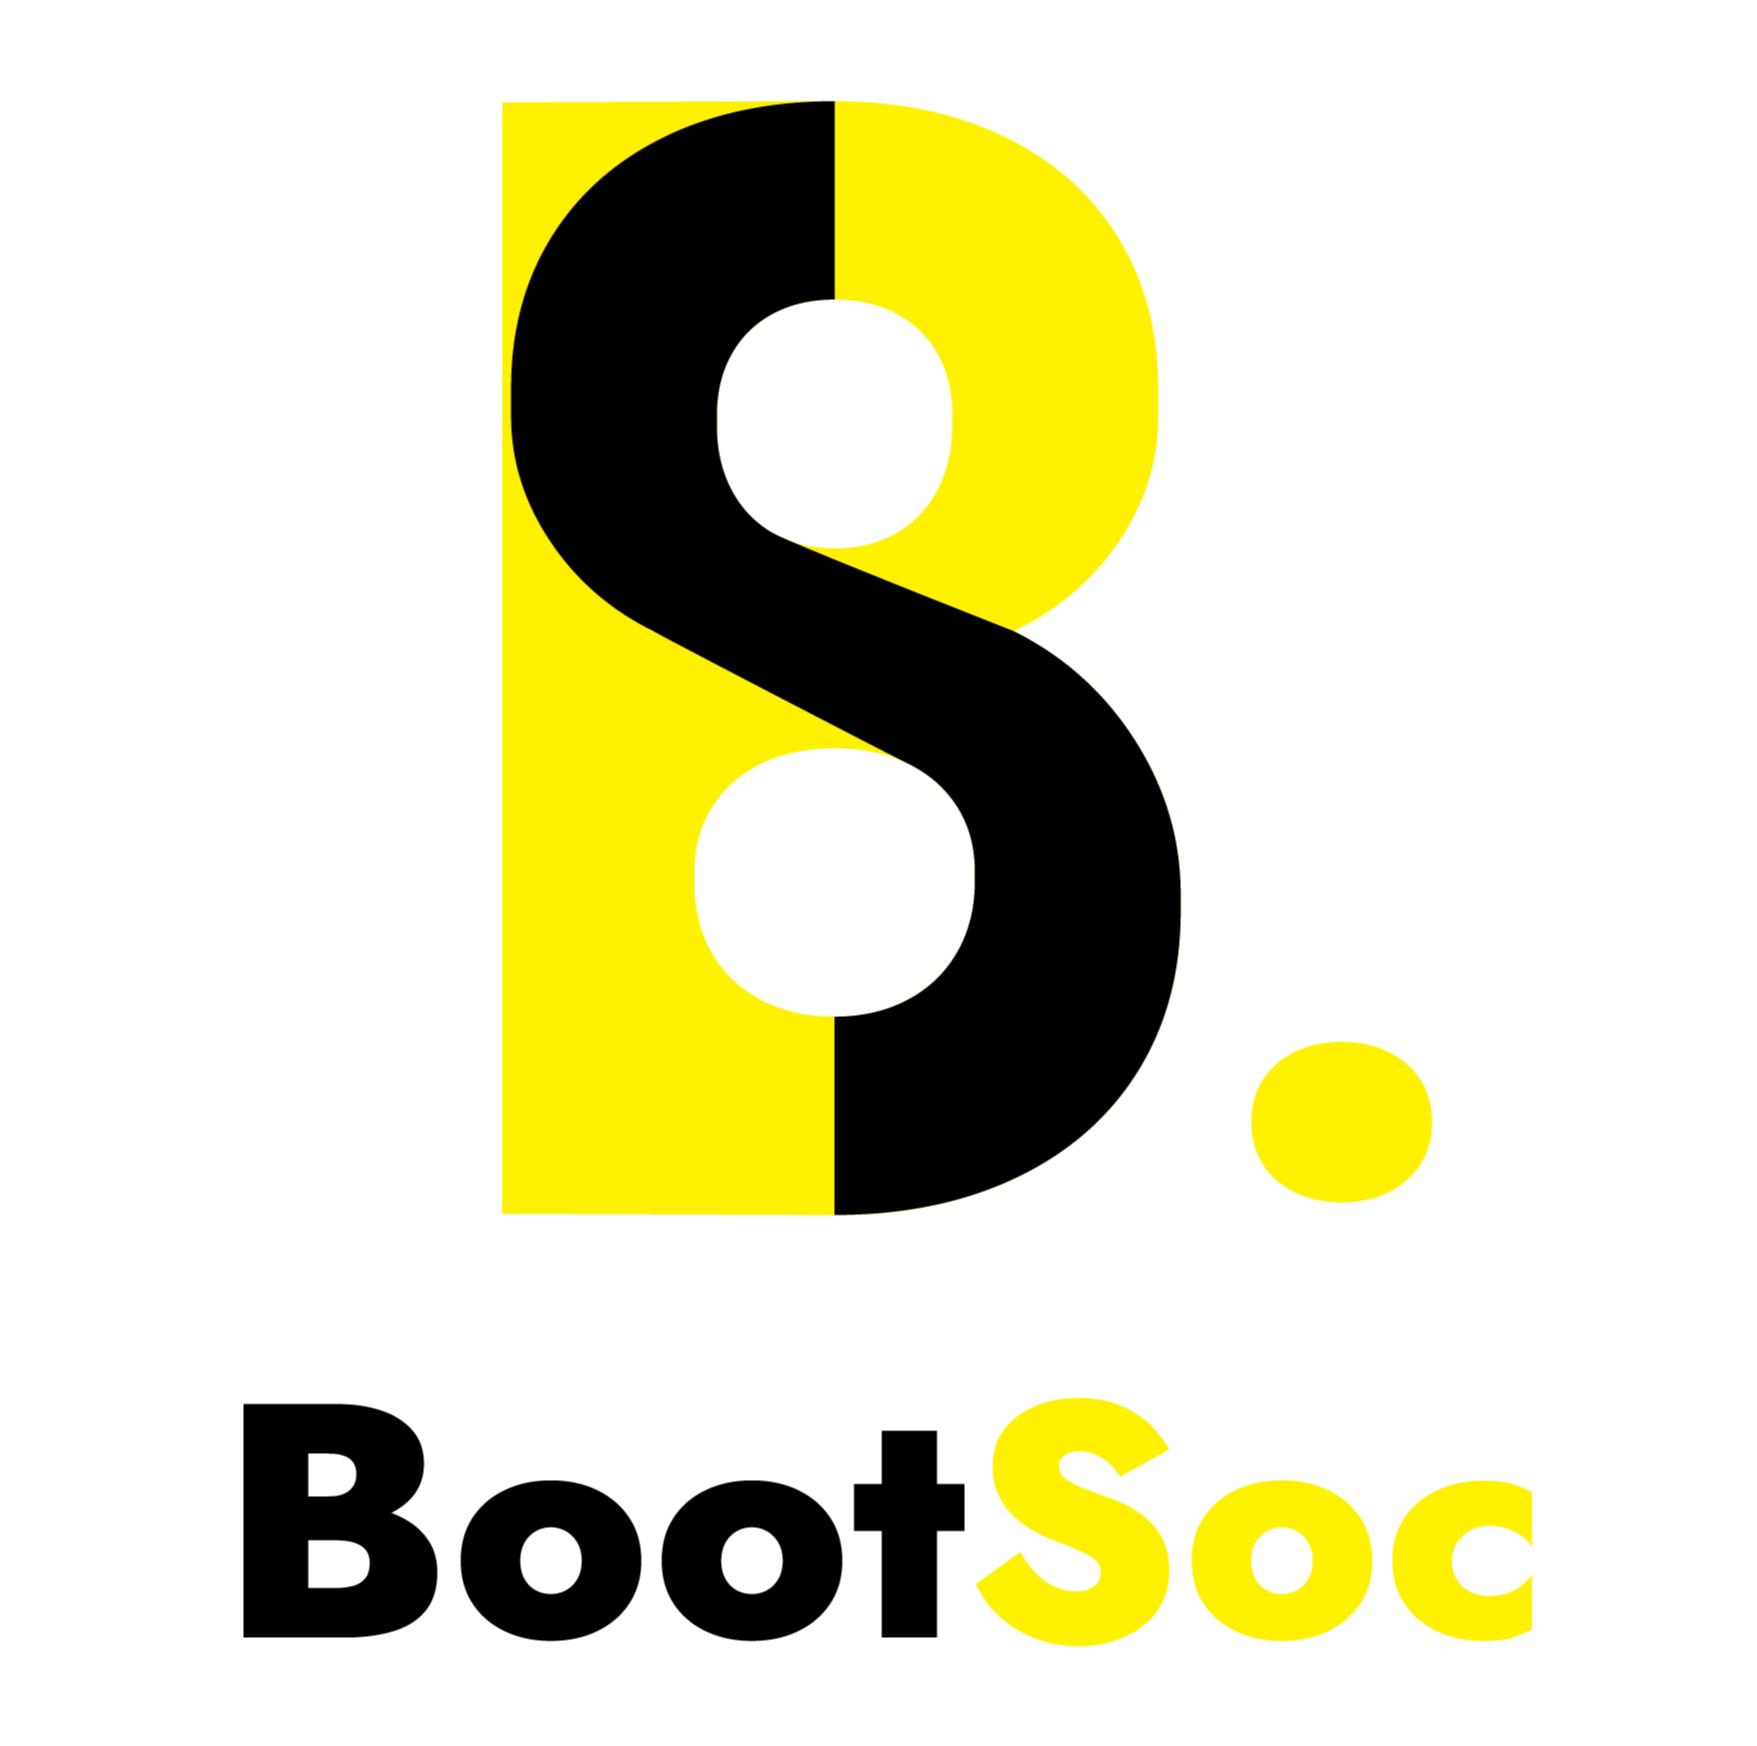 BootSoc